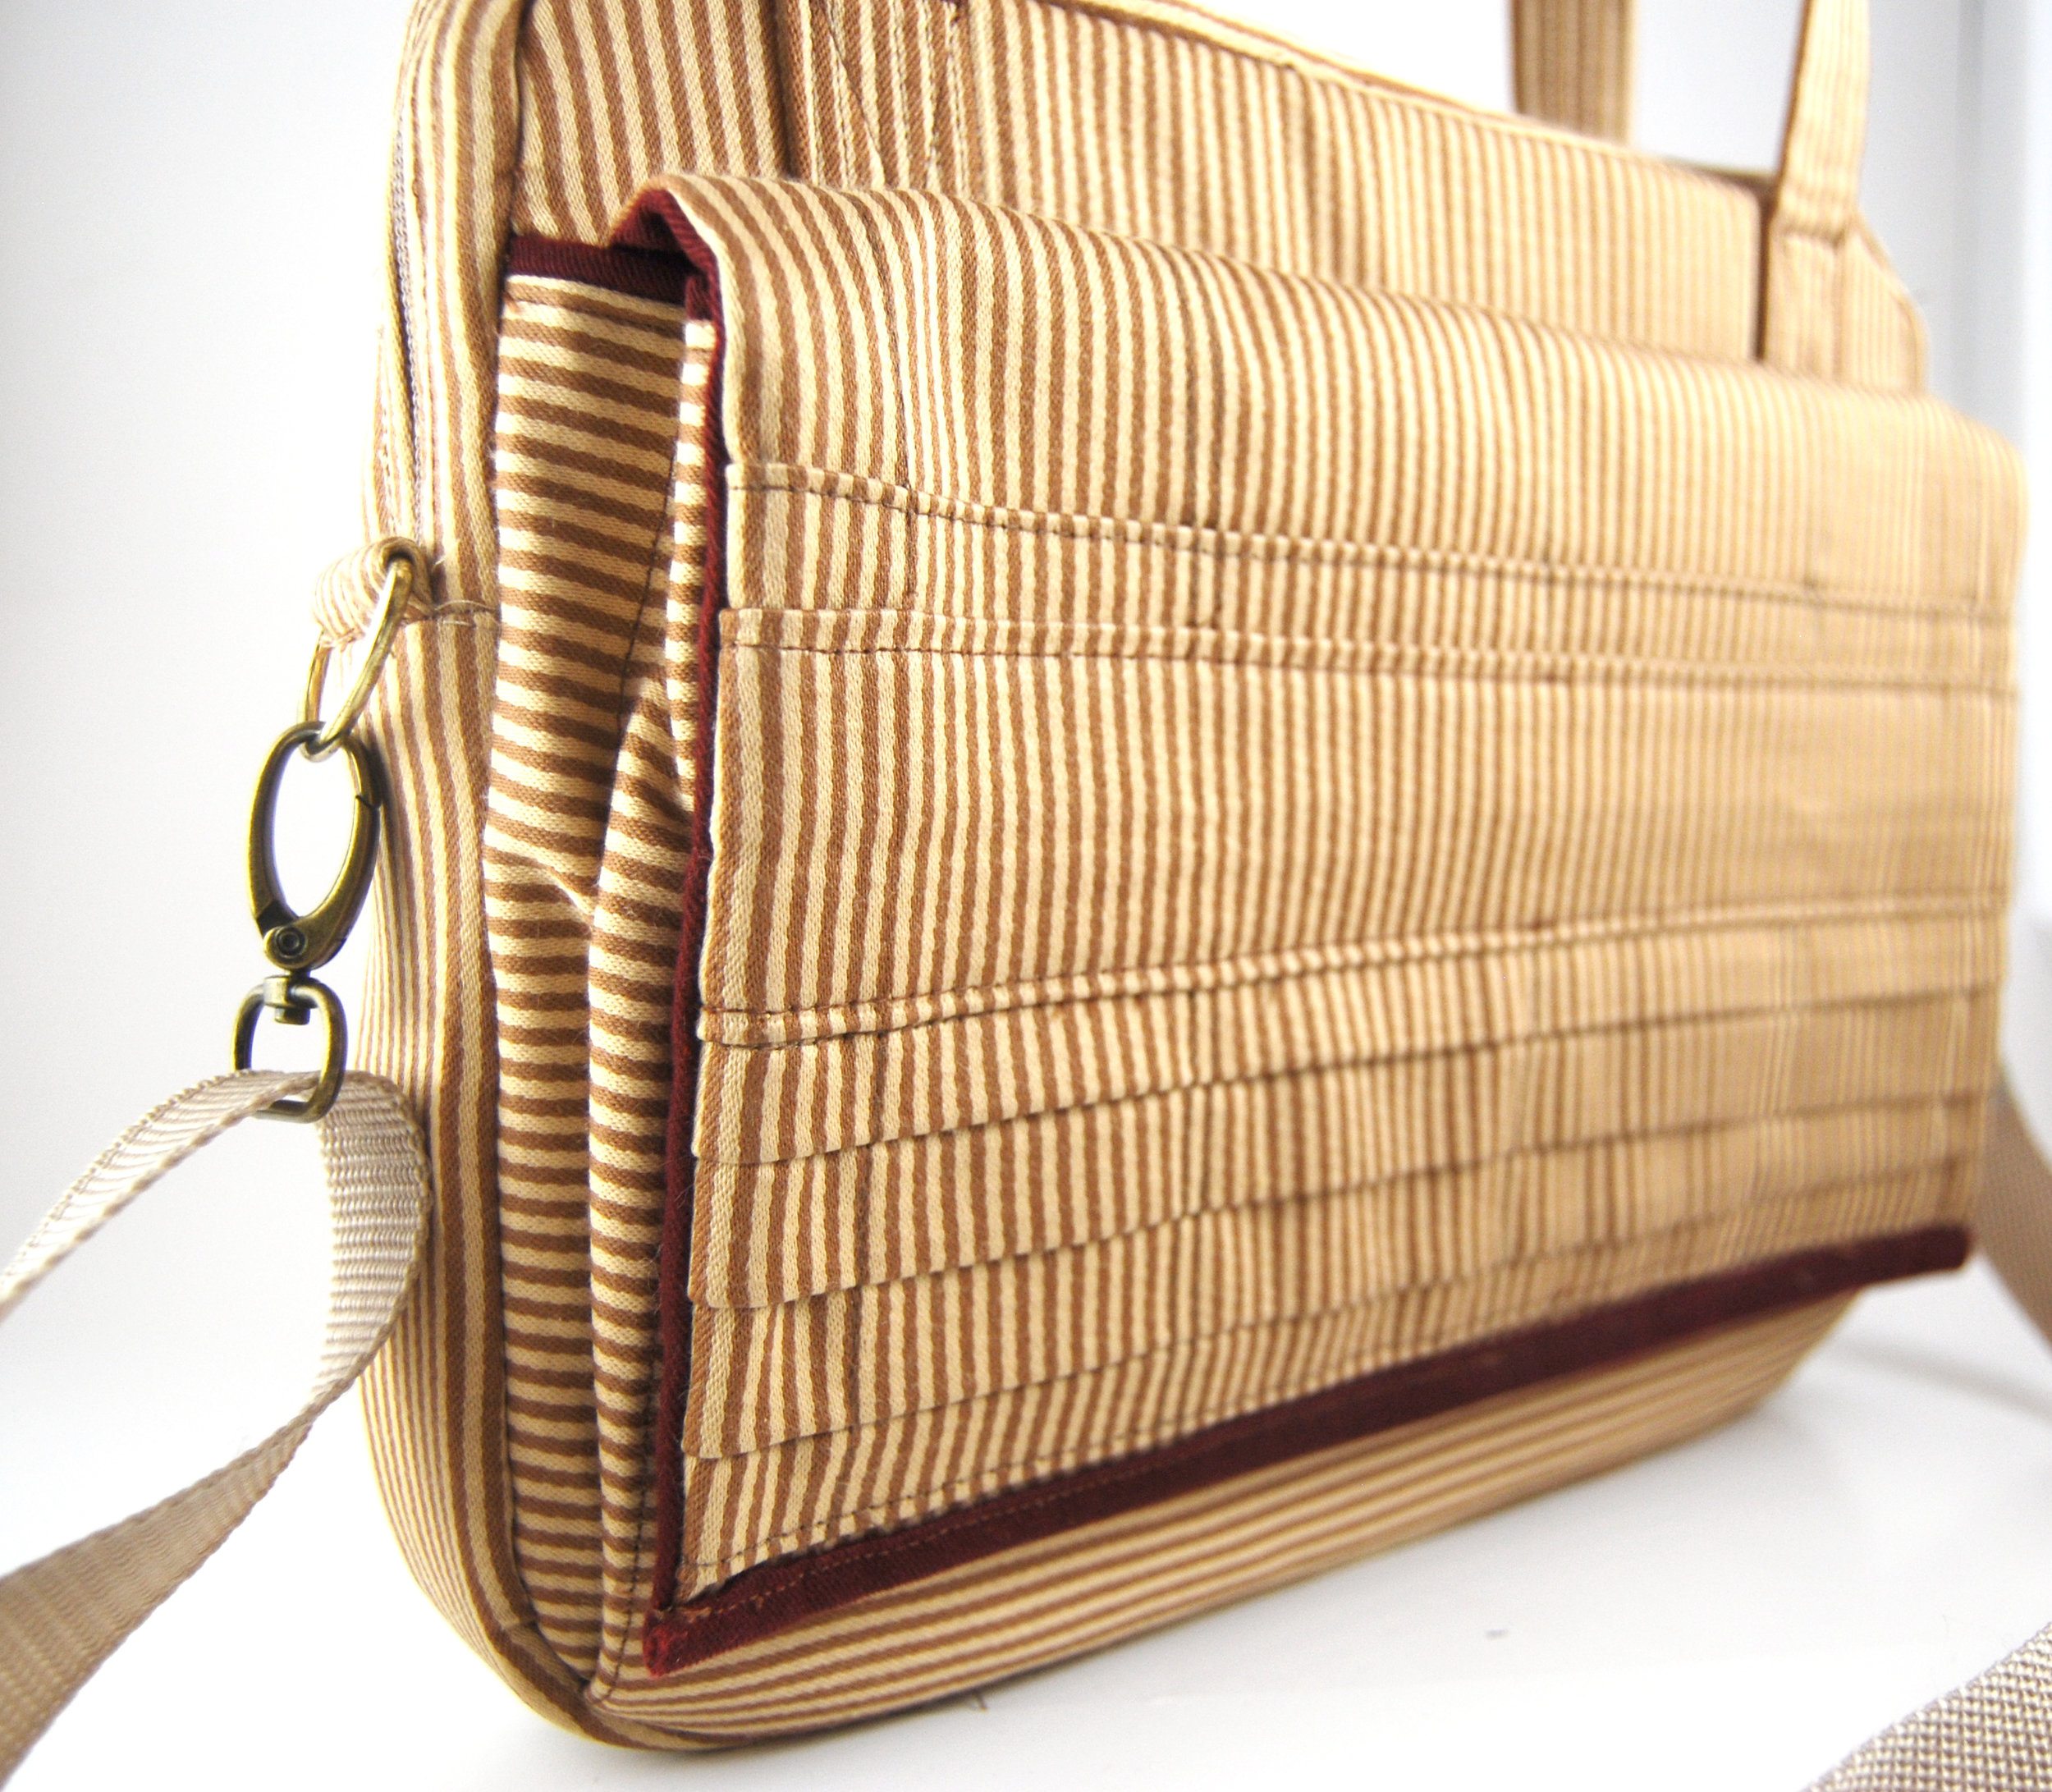 shadalene-design-sewing-bag-2.jpg